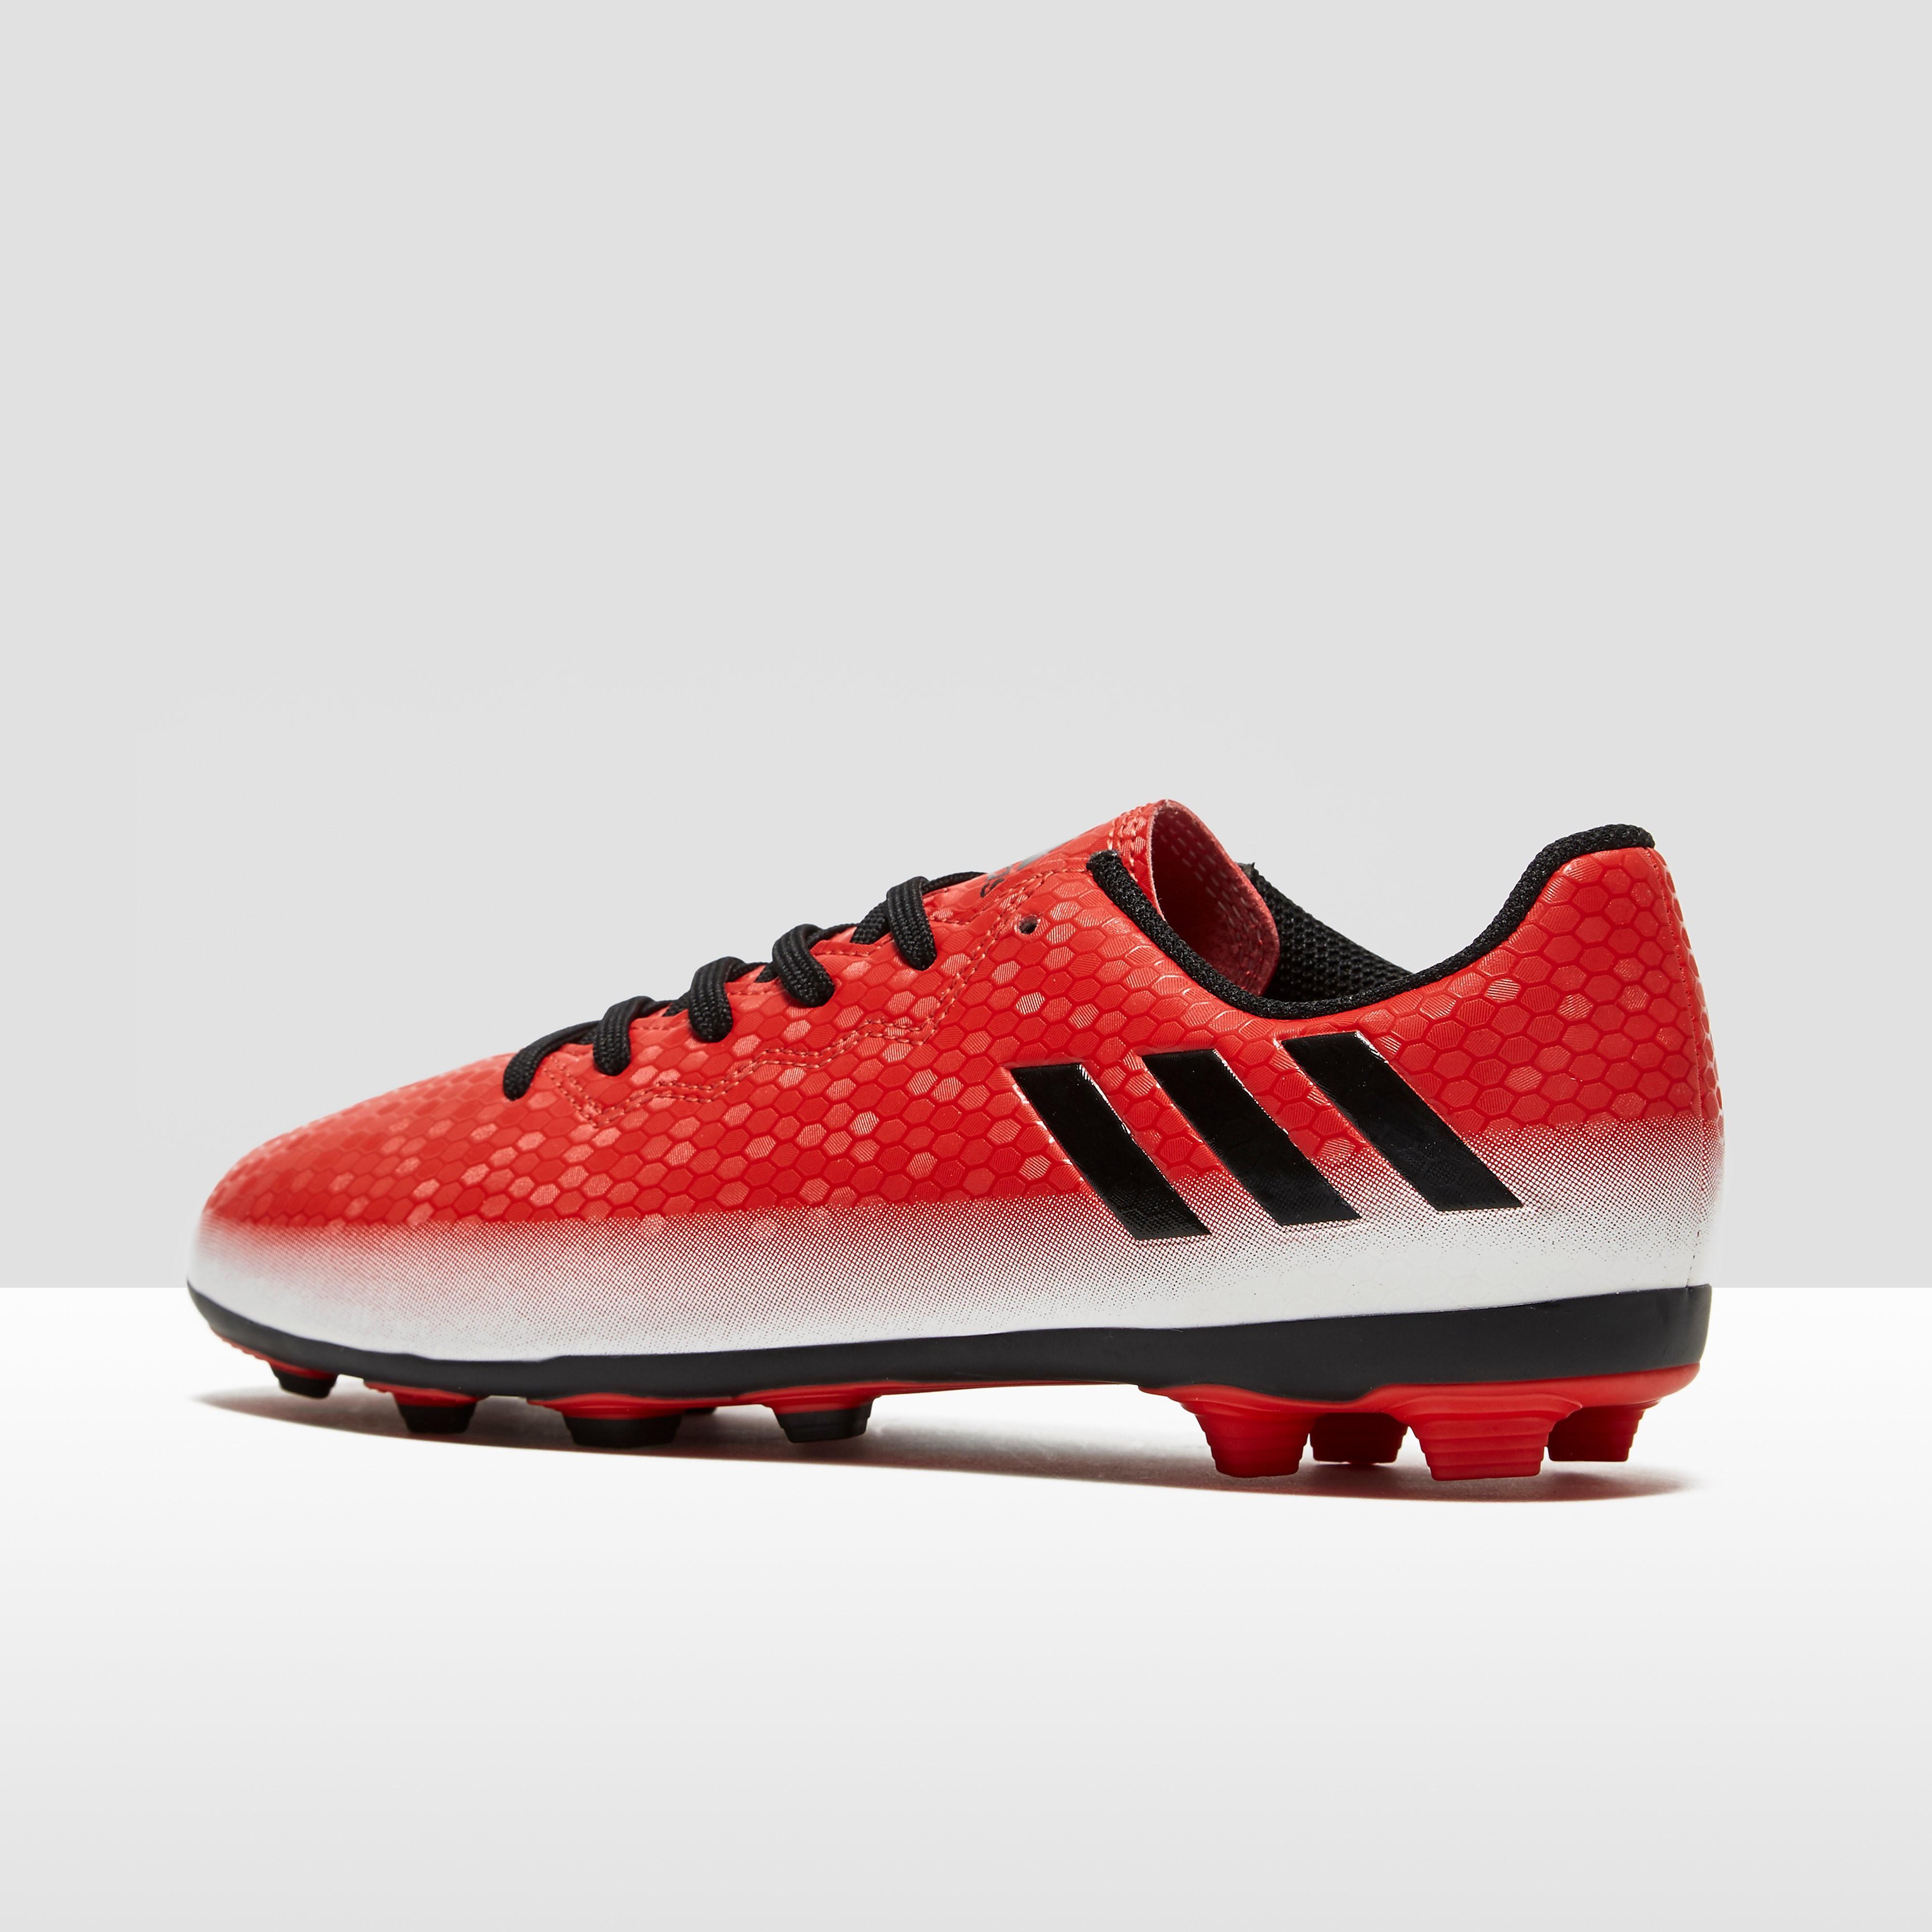 adidas Messi 16.4 Junior Firm Ground Football Boots